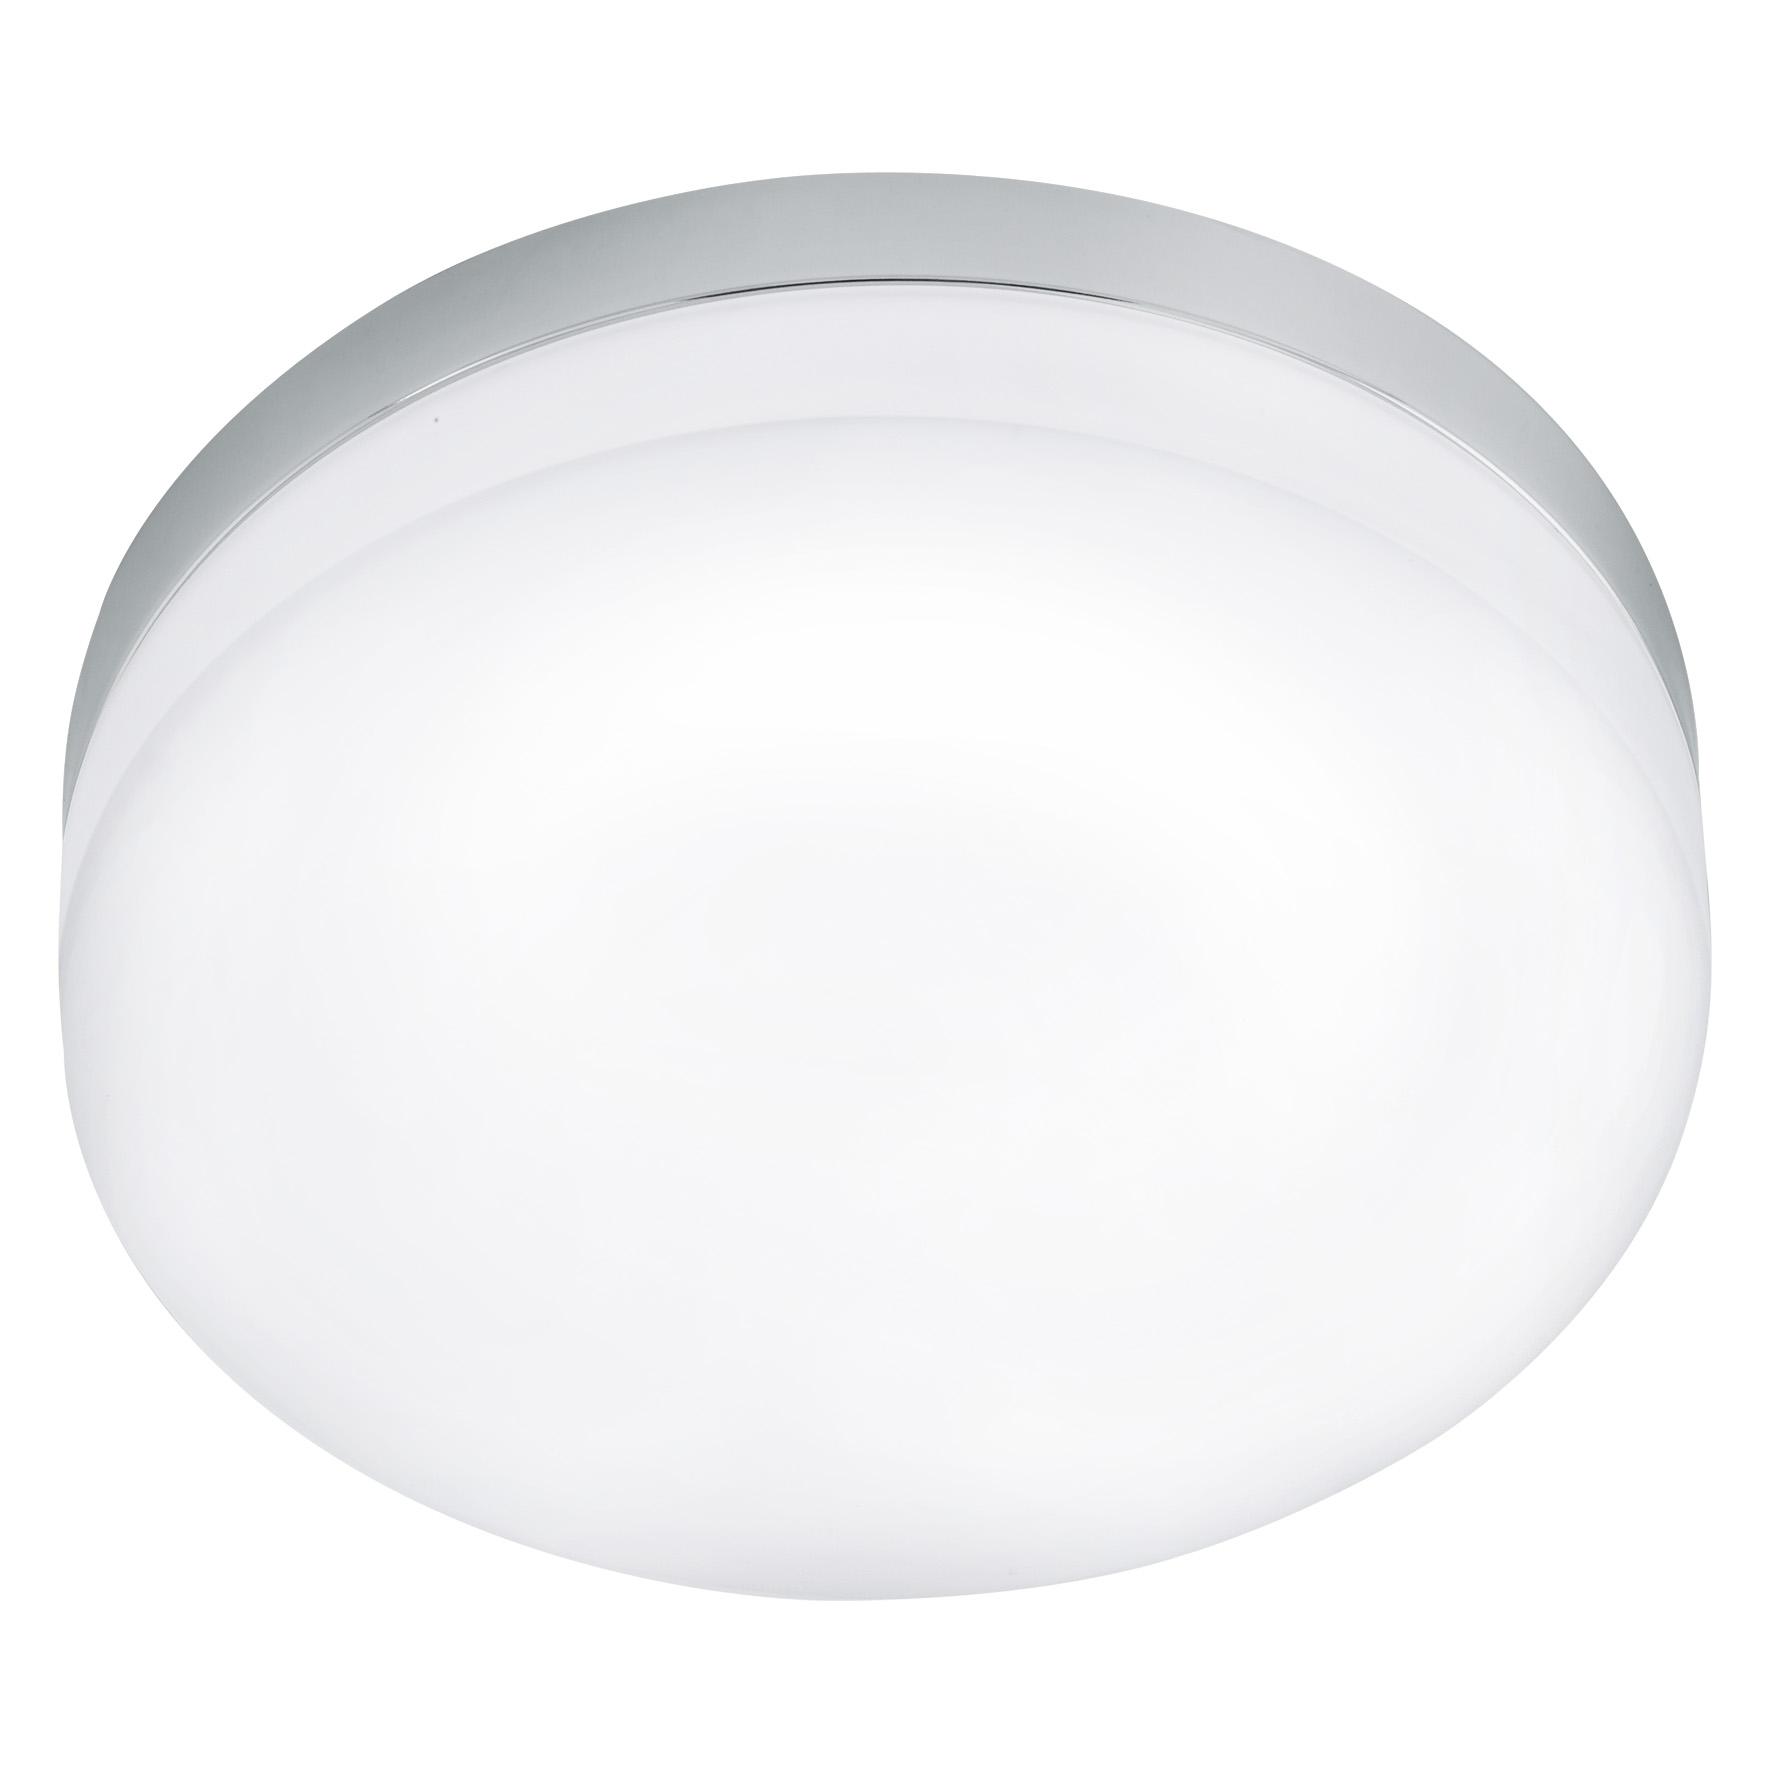 led lights bathroom ceiling photo - 2